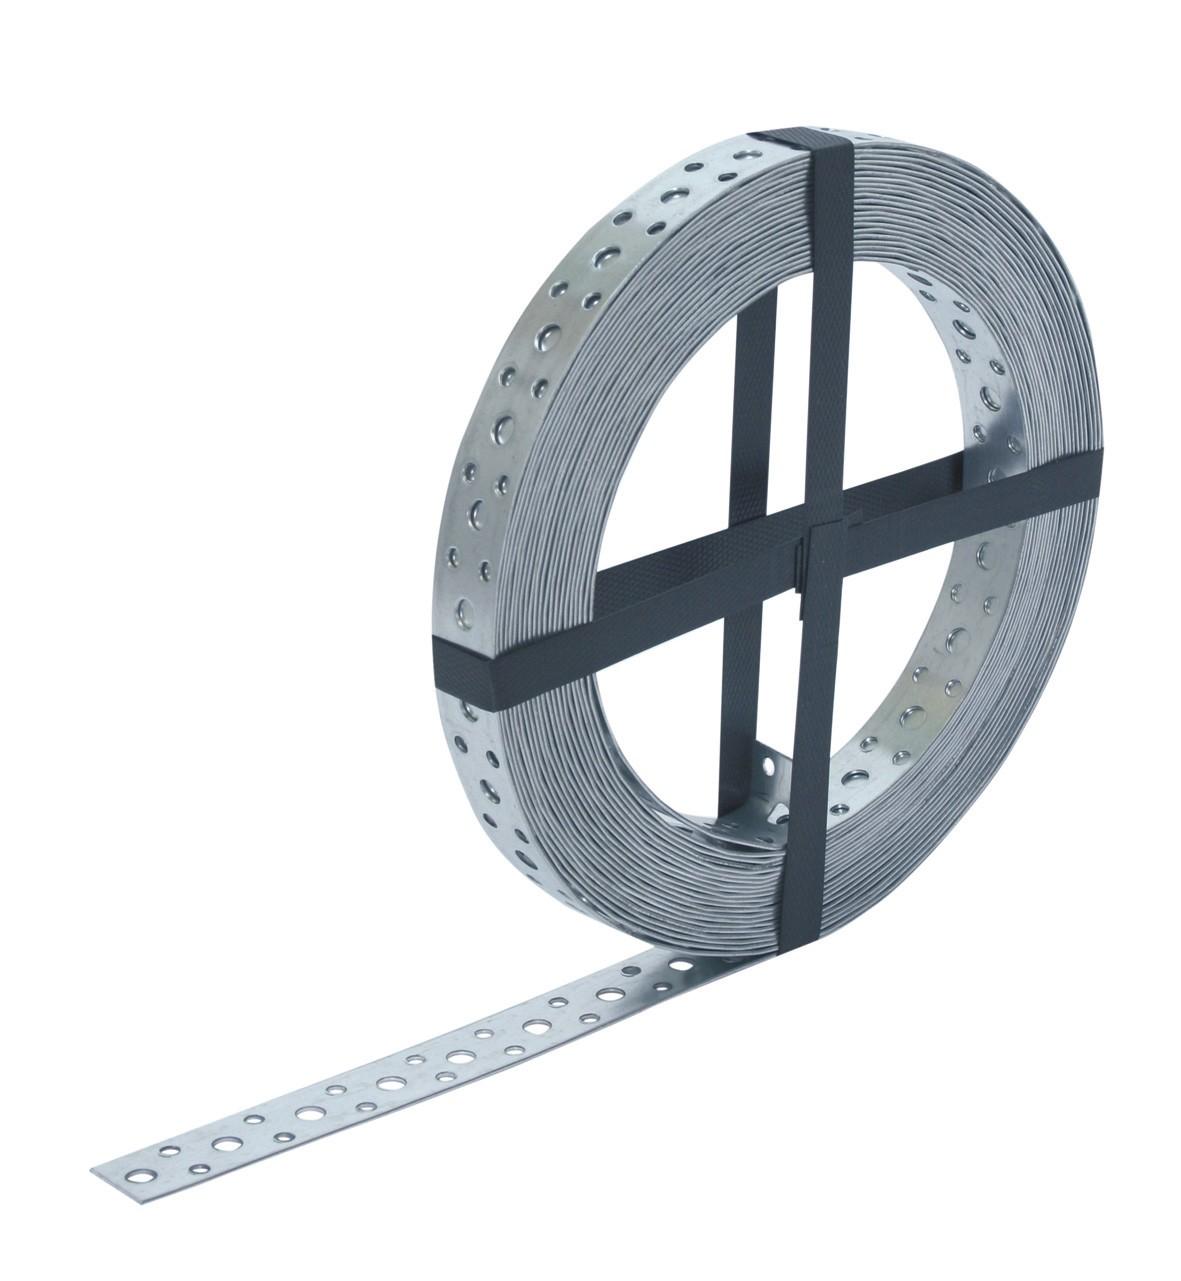 Montageband / windverband 50 mtr 30x1,5 SV